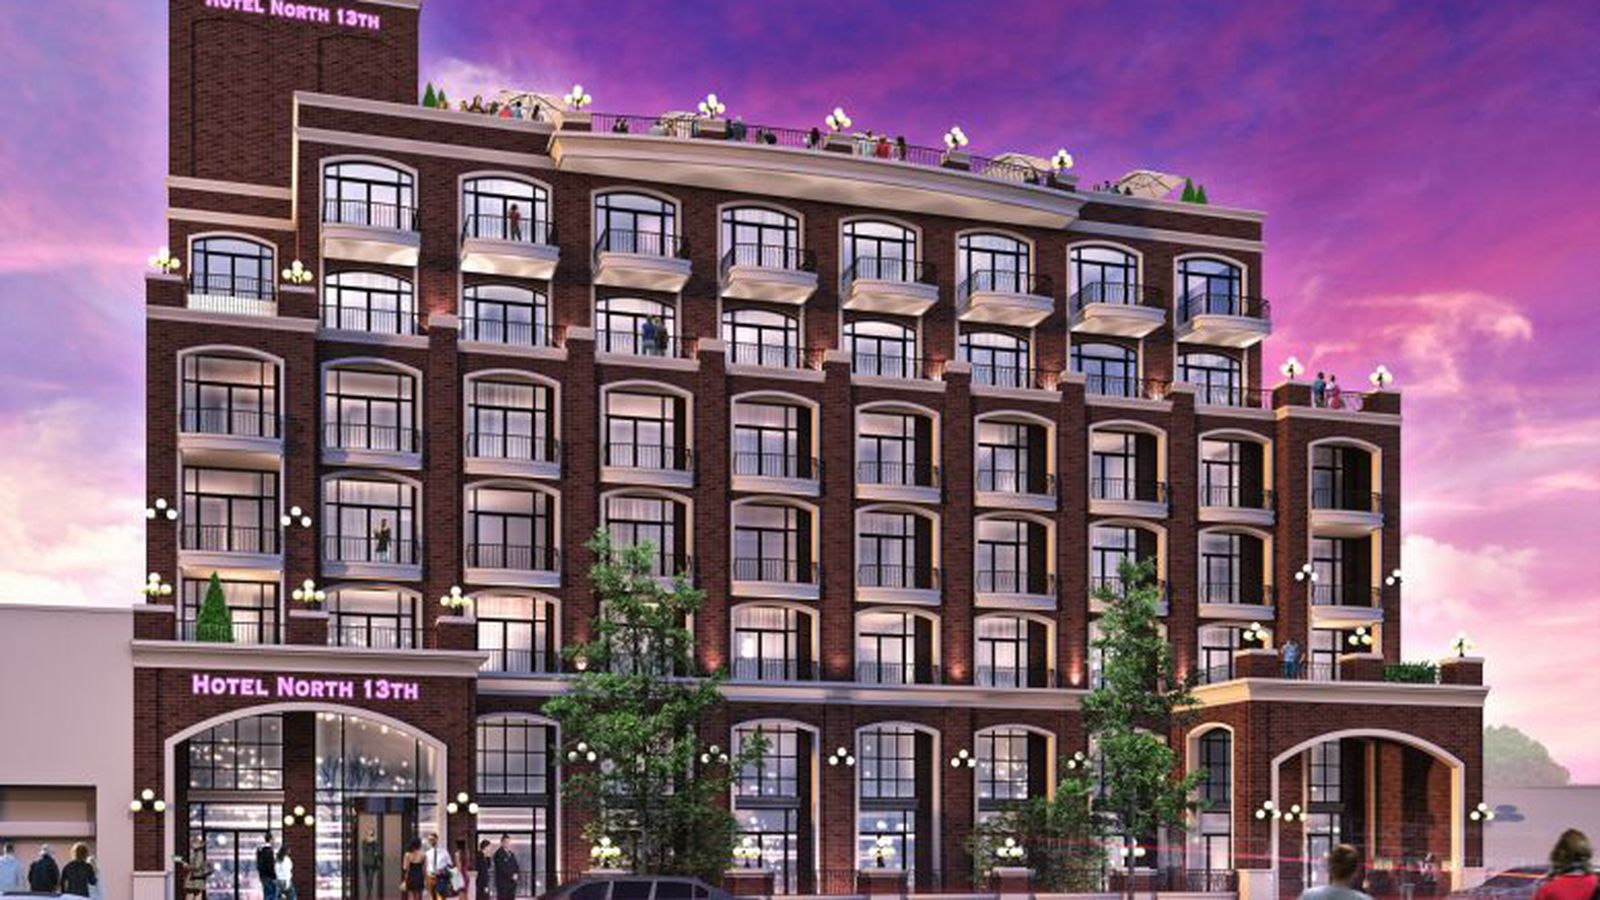 Hotels Near Th Street Philadelphia